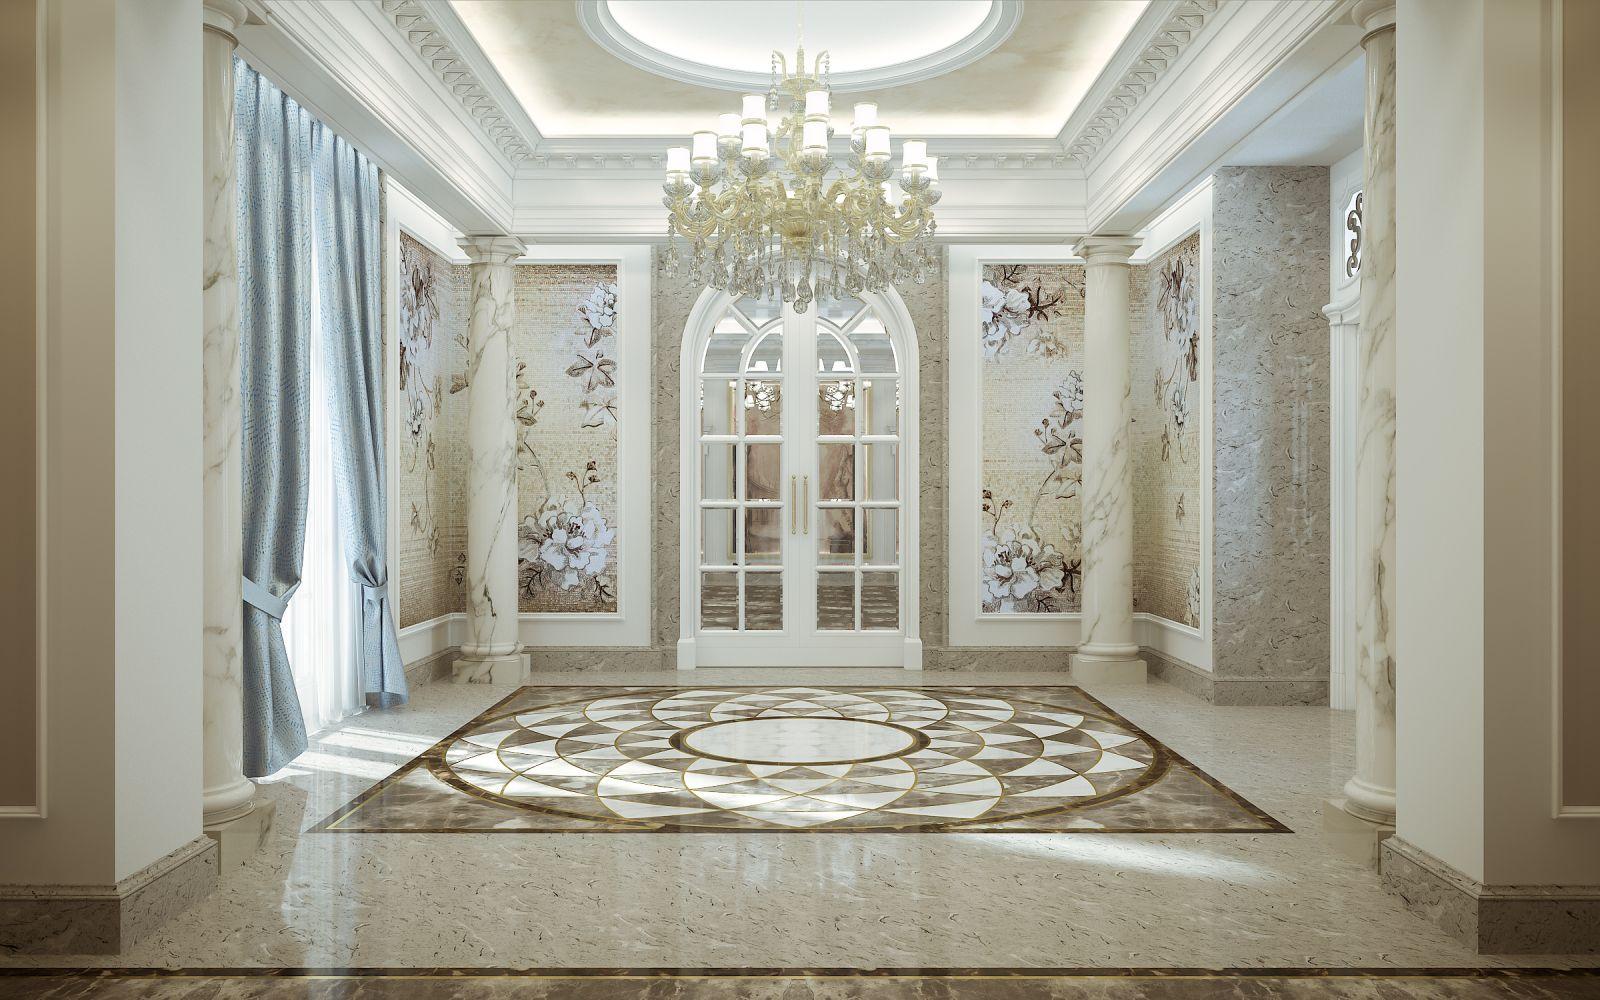 Family House - Saudi Arabia 779